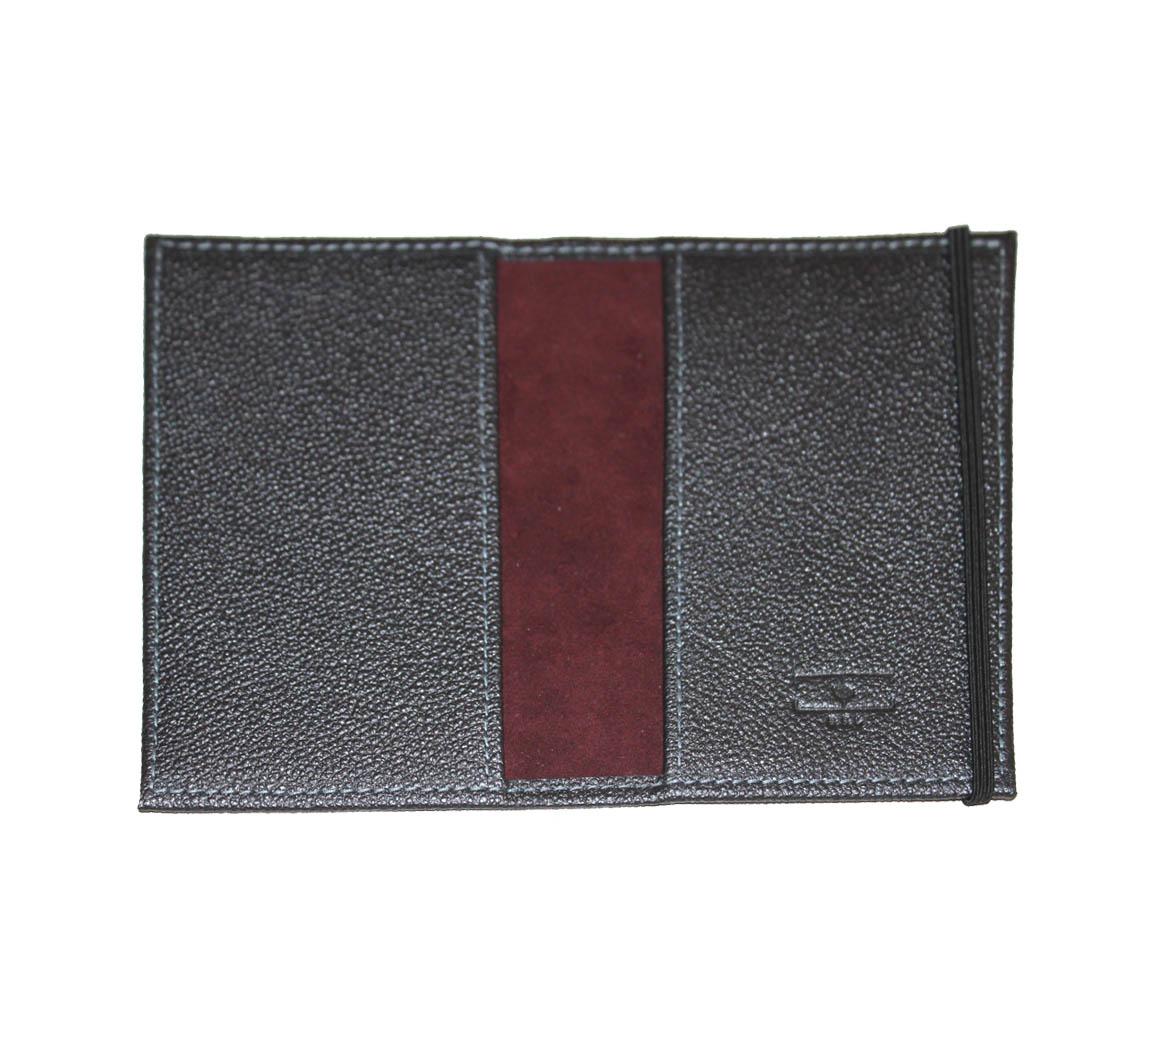 Protège passeport en cuir Porte Passeport BSL